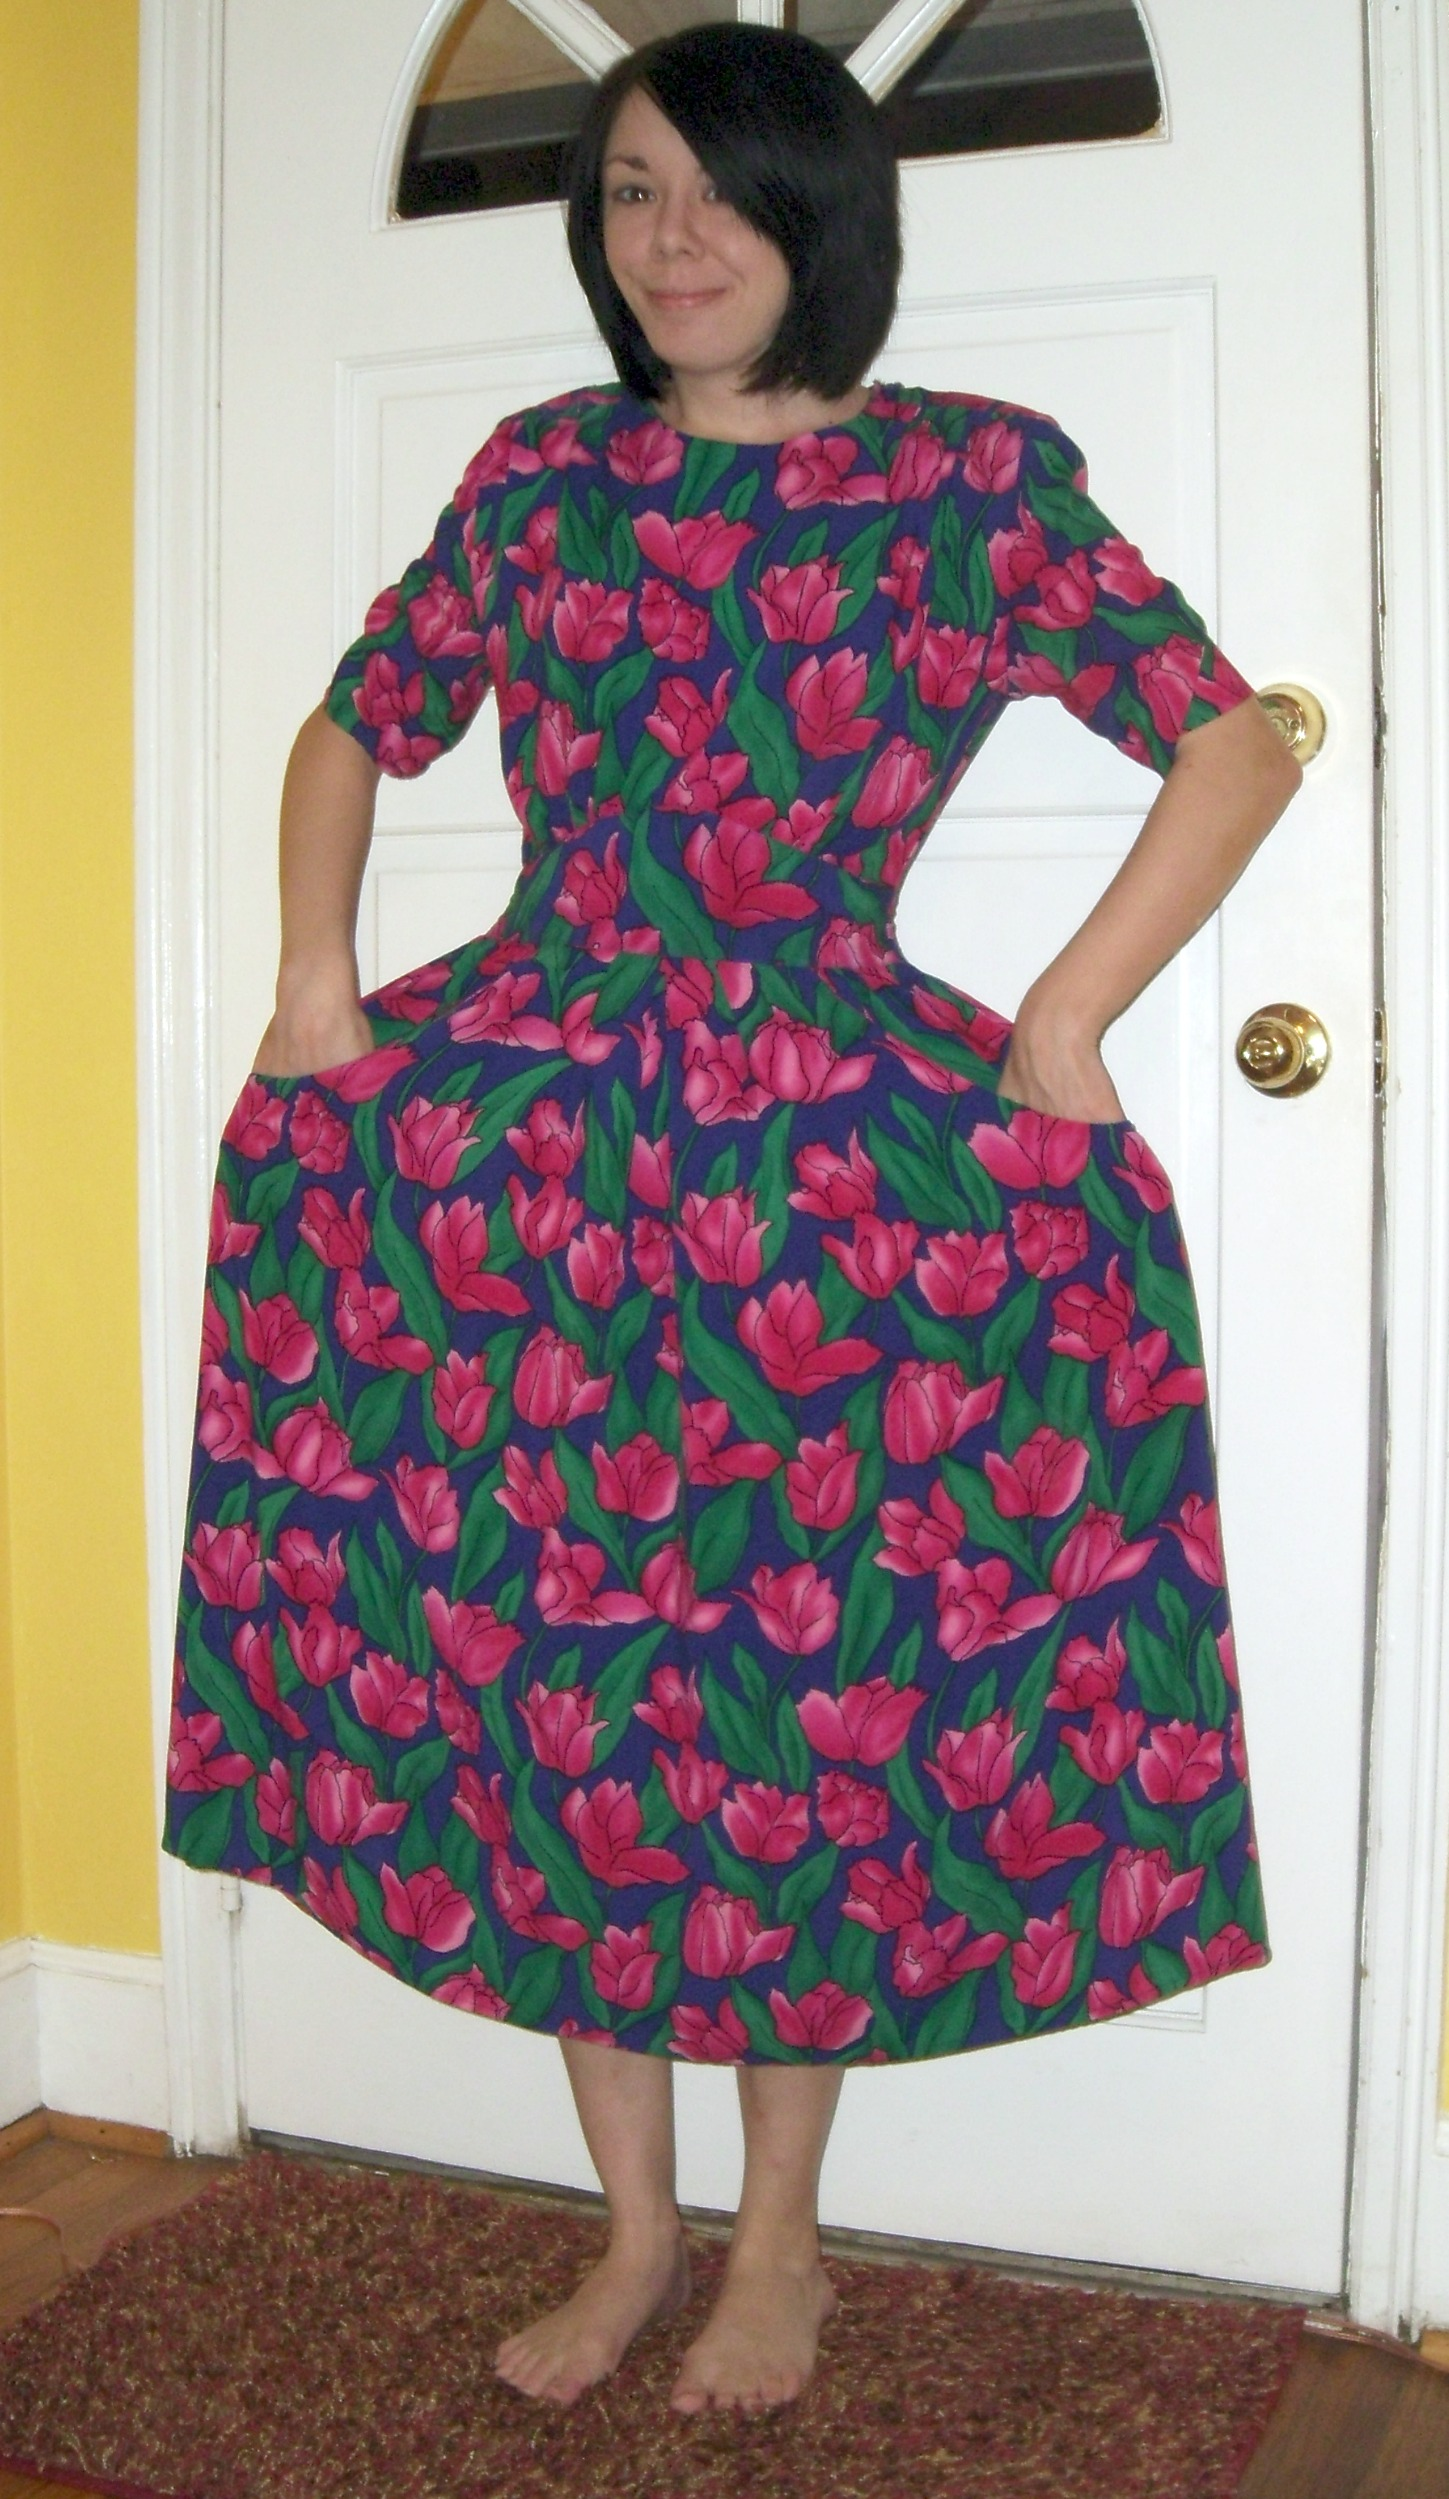 Day 193: Monday Fun Day Dress 2